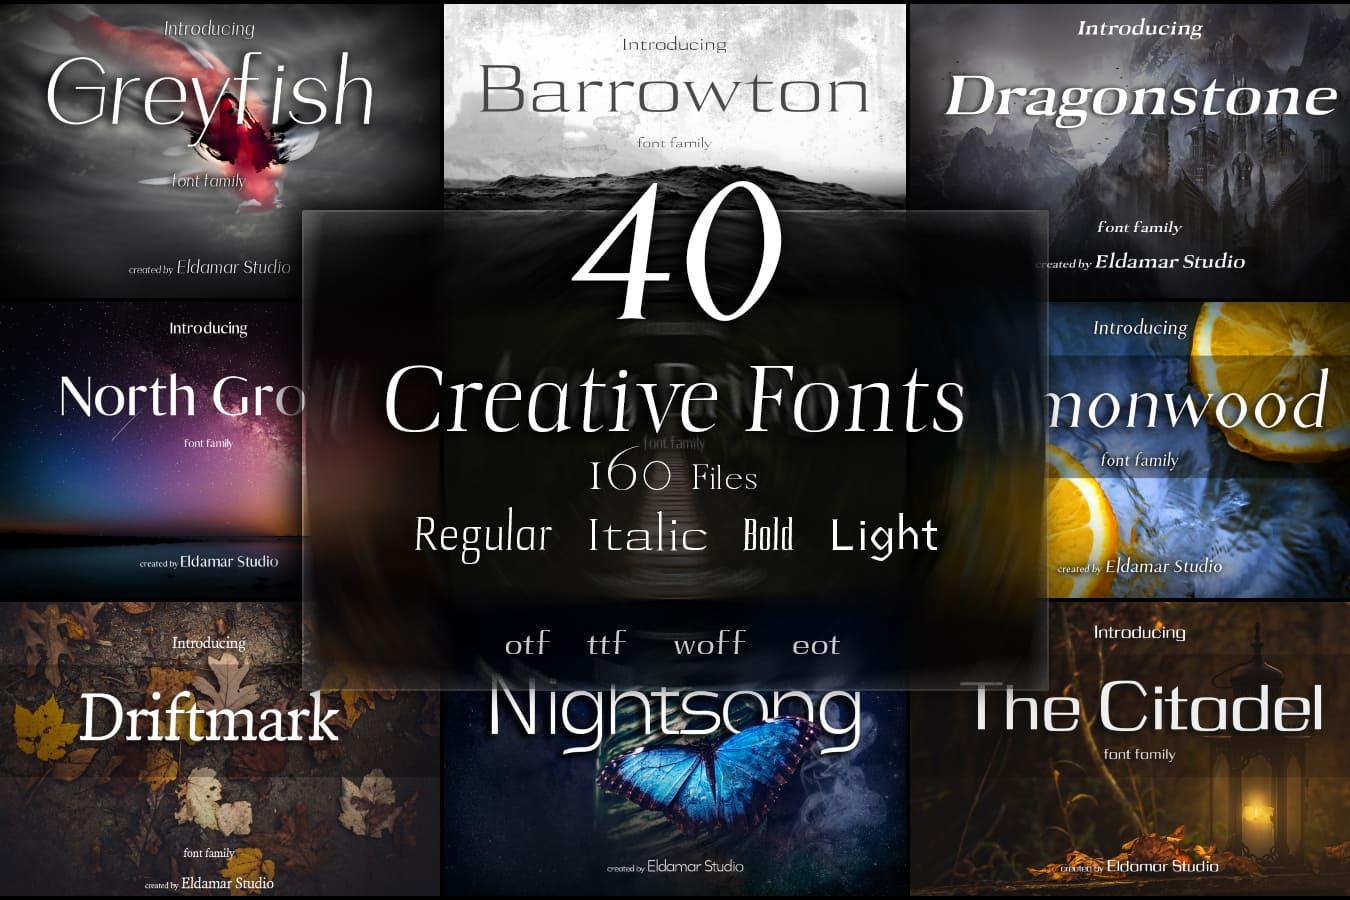 Fun Fonts - 40 Creative Fonts - 160 Files - Just $15 - fe51331f8aff0052d46bef7f359dc8f0 resize min